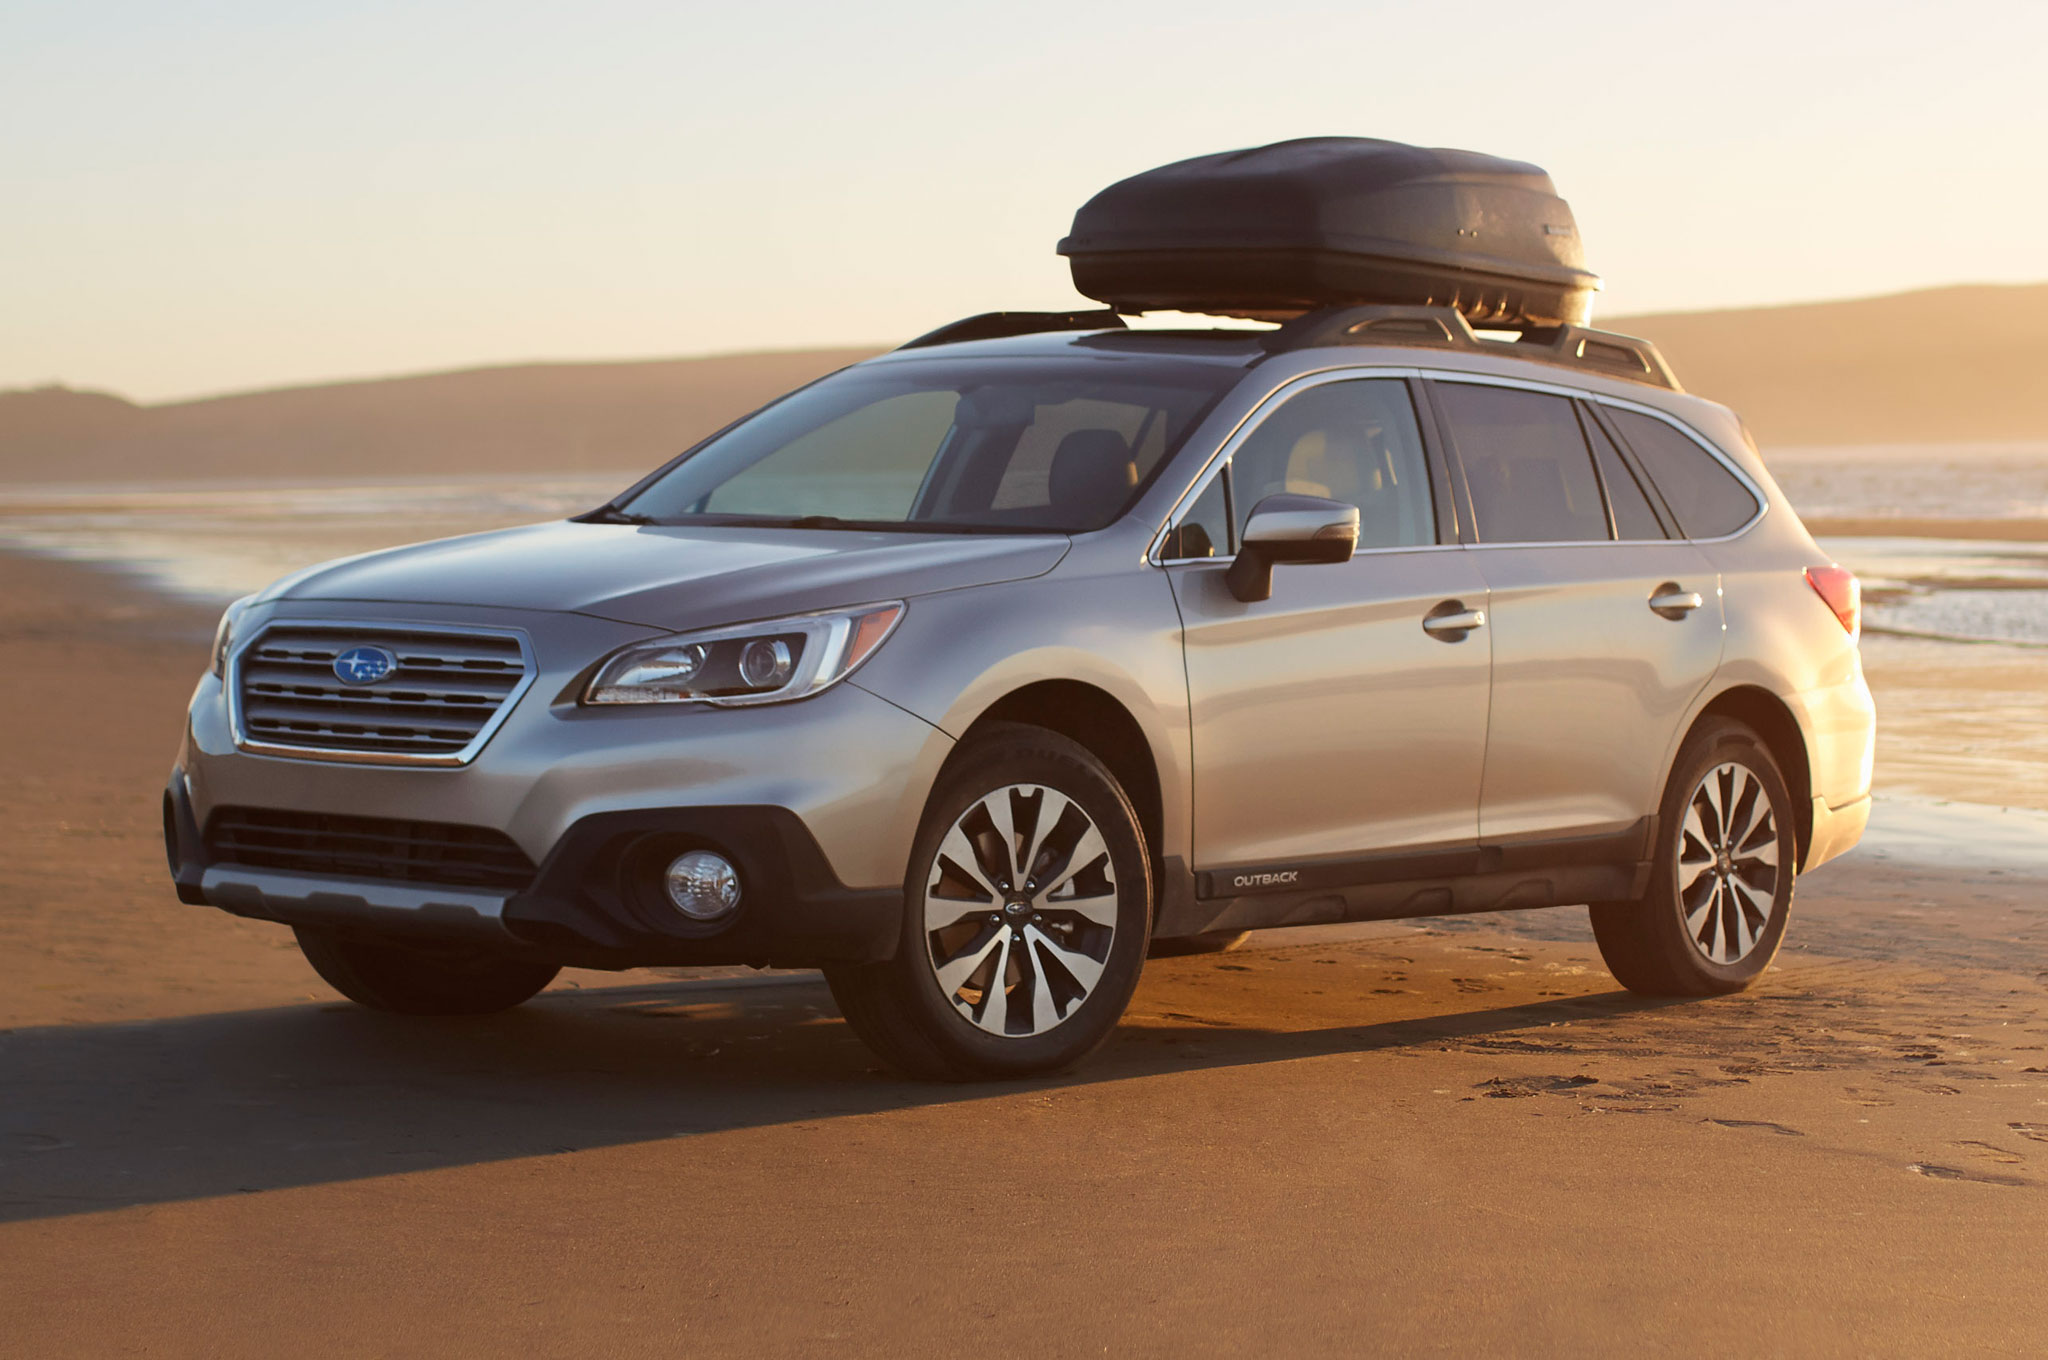 2015 subaru outback priced at $25,745 - automobile magazine